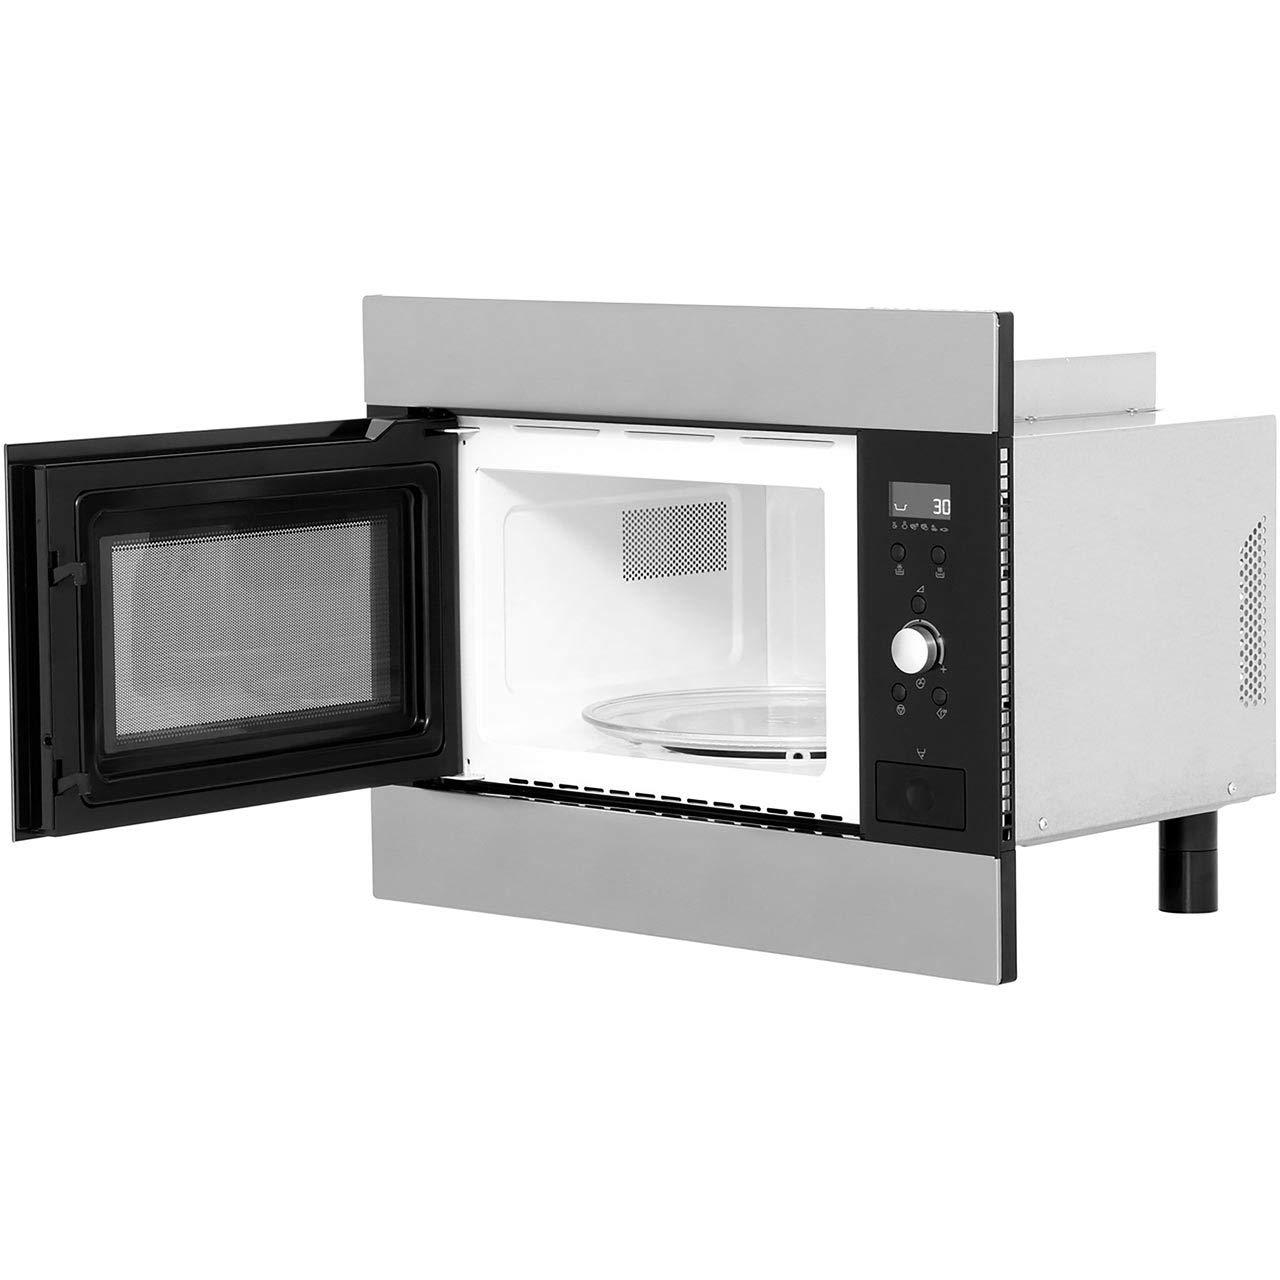 Zanussi ZBM26642XA Microwave, Stainless